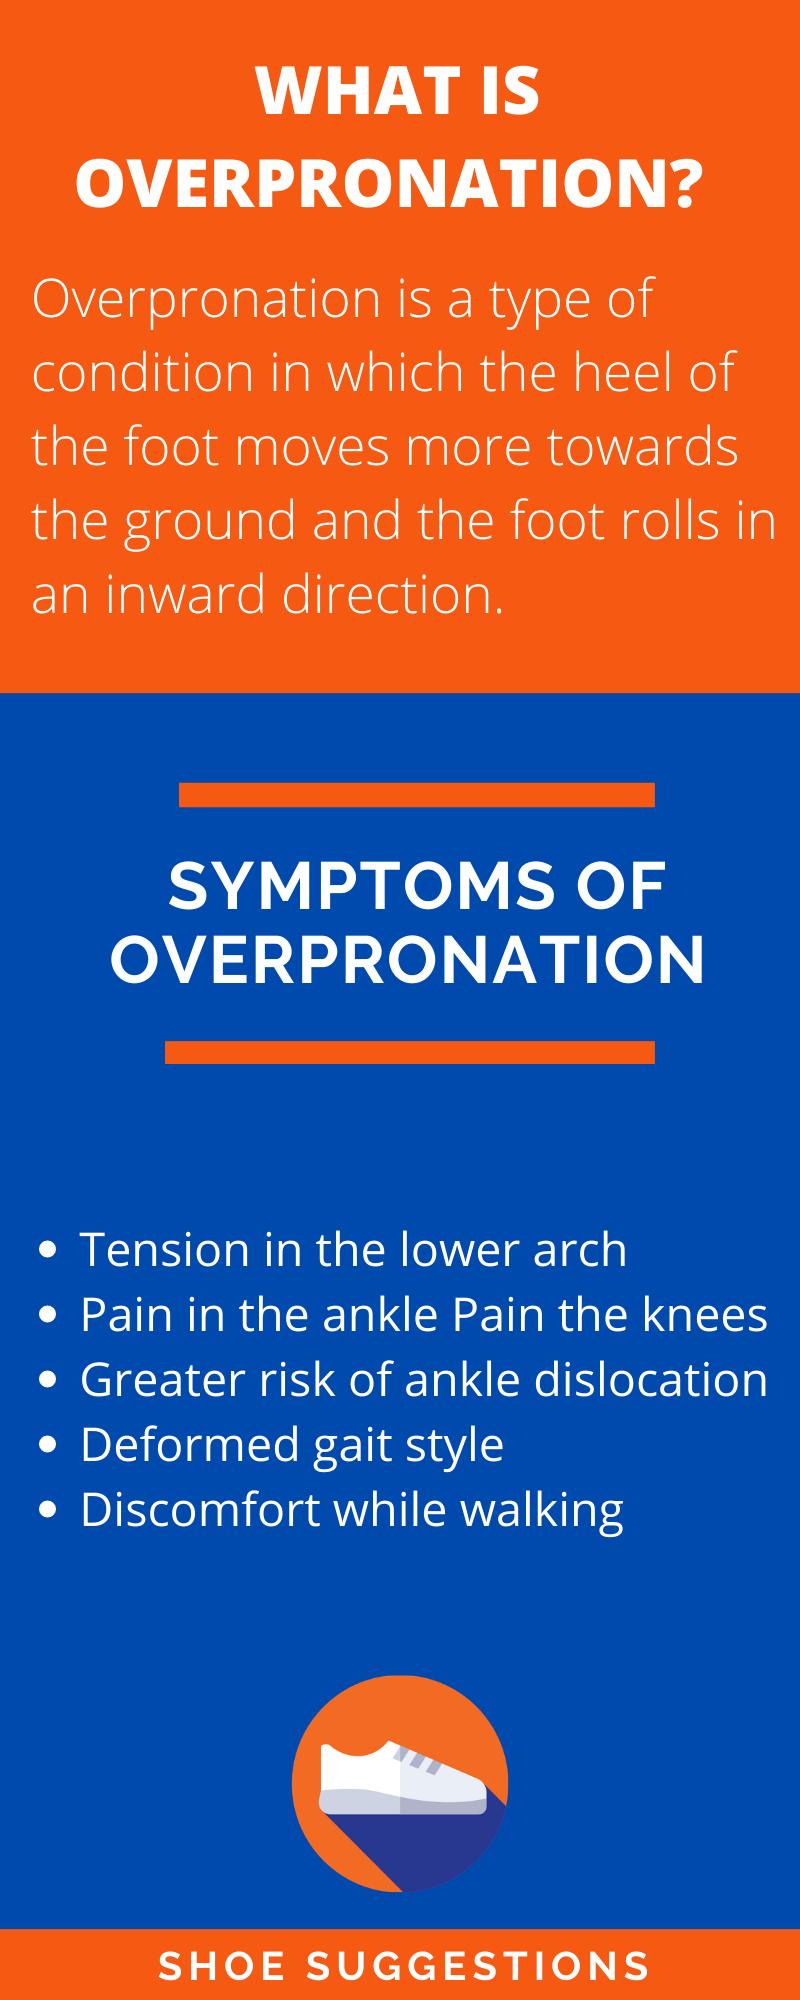 Symptoms of overpronation